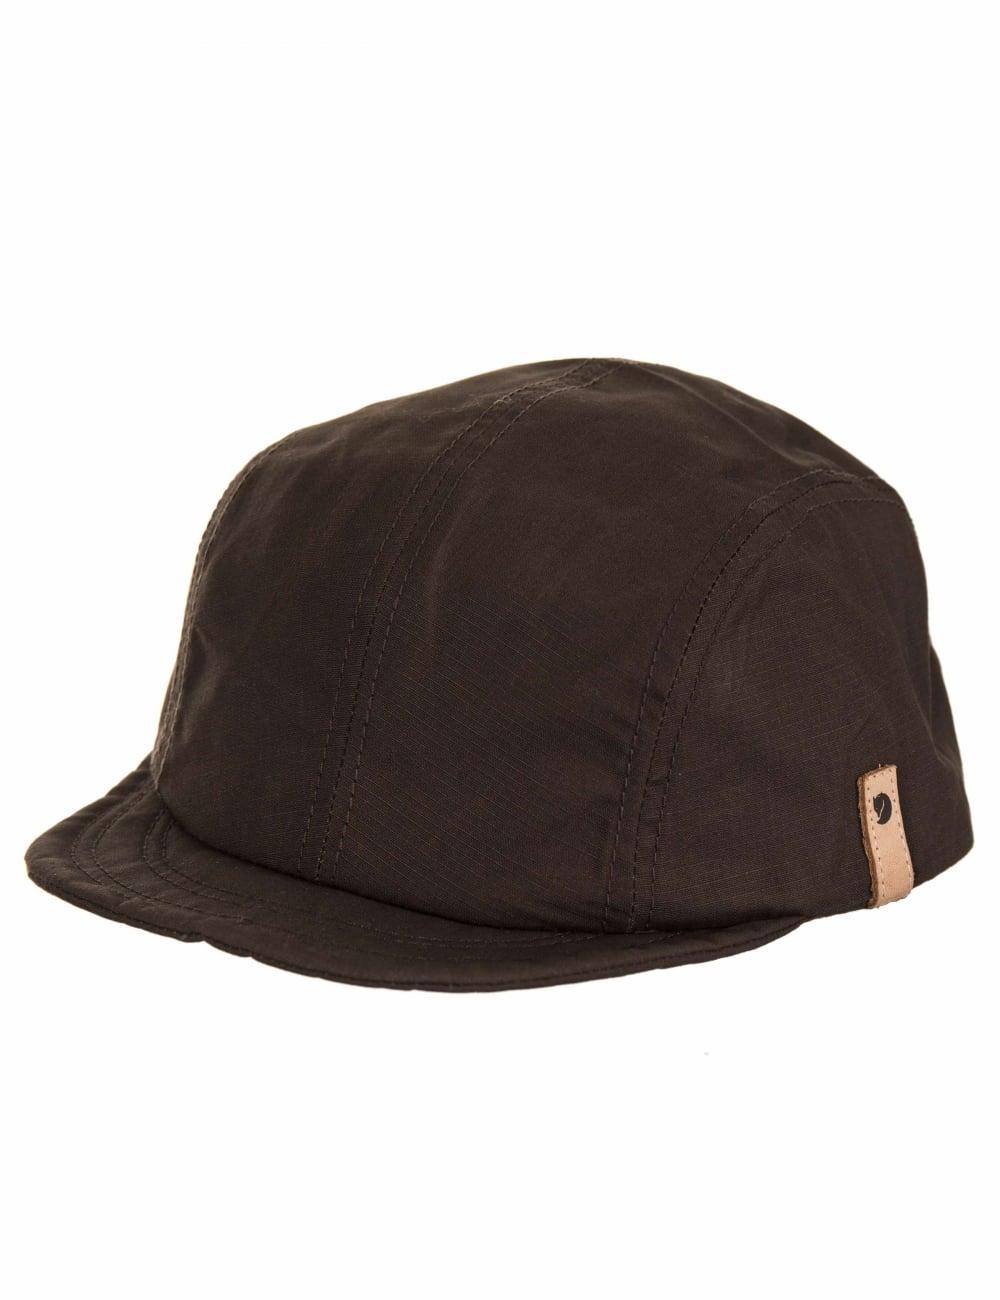 5942437ce88 Fjallraven Abisko Cap - Dark Olive - Hat Shop from Fat Buddha Store UK